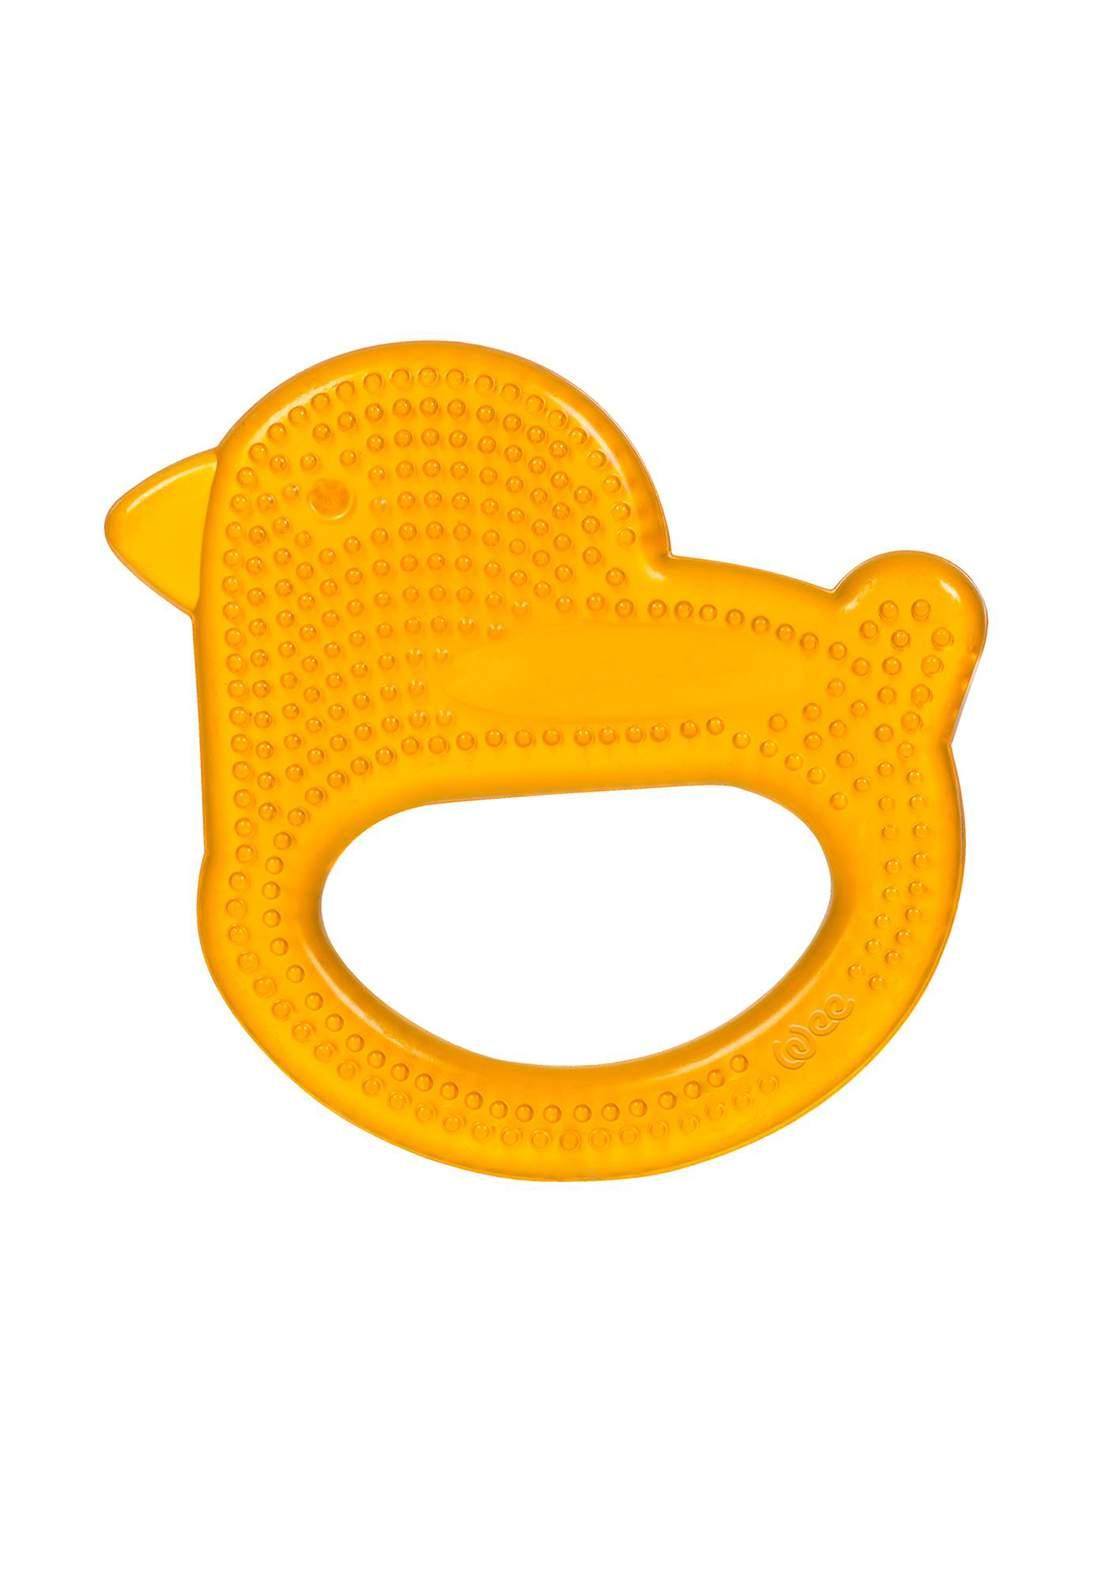 Wee Baby 859 Water Bird Teether Orange عضاضة اطفال مائية